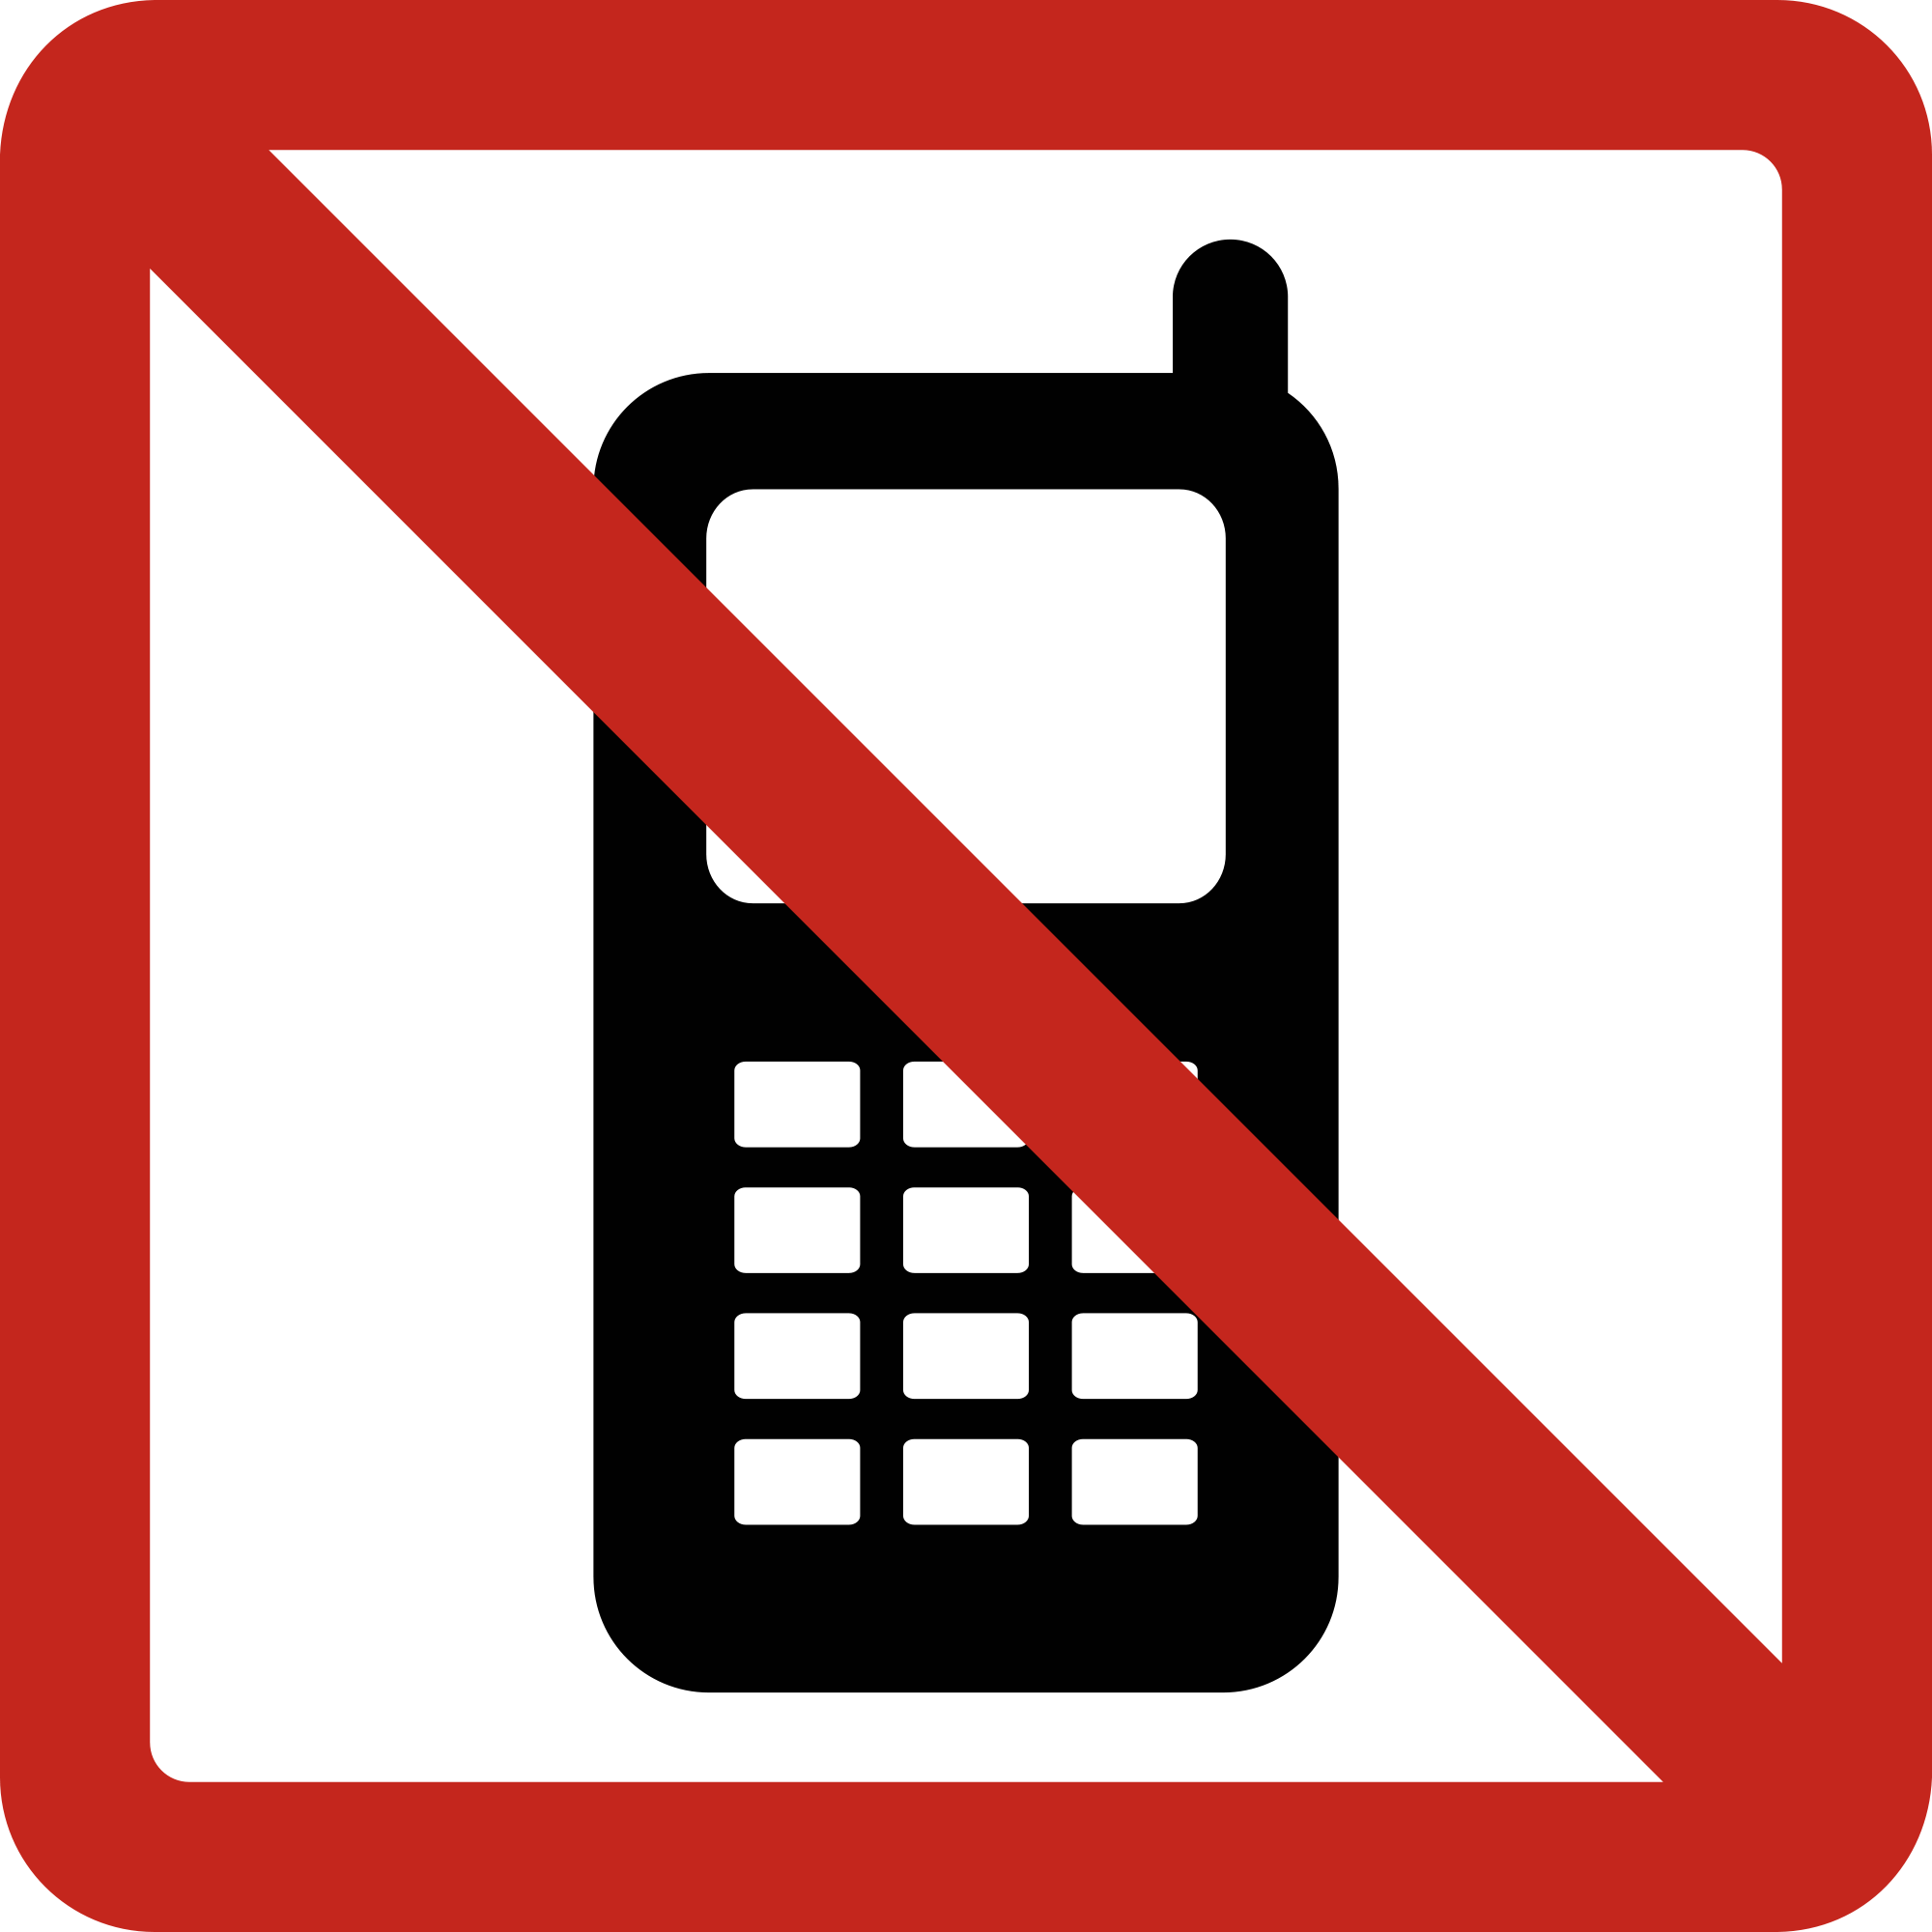 Driving clipart svg. File no cellphone wikimedia